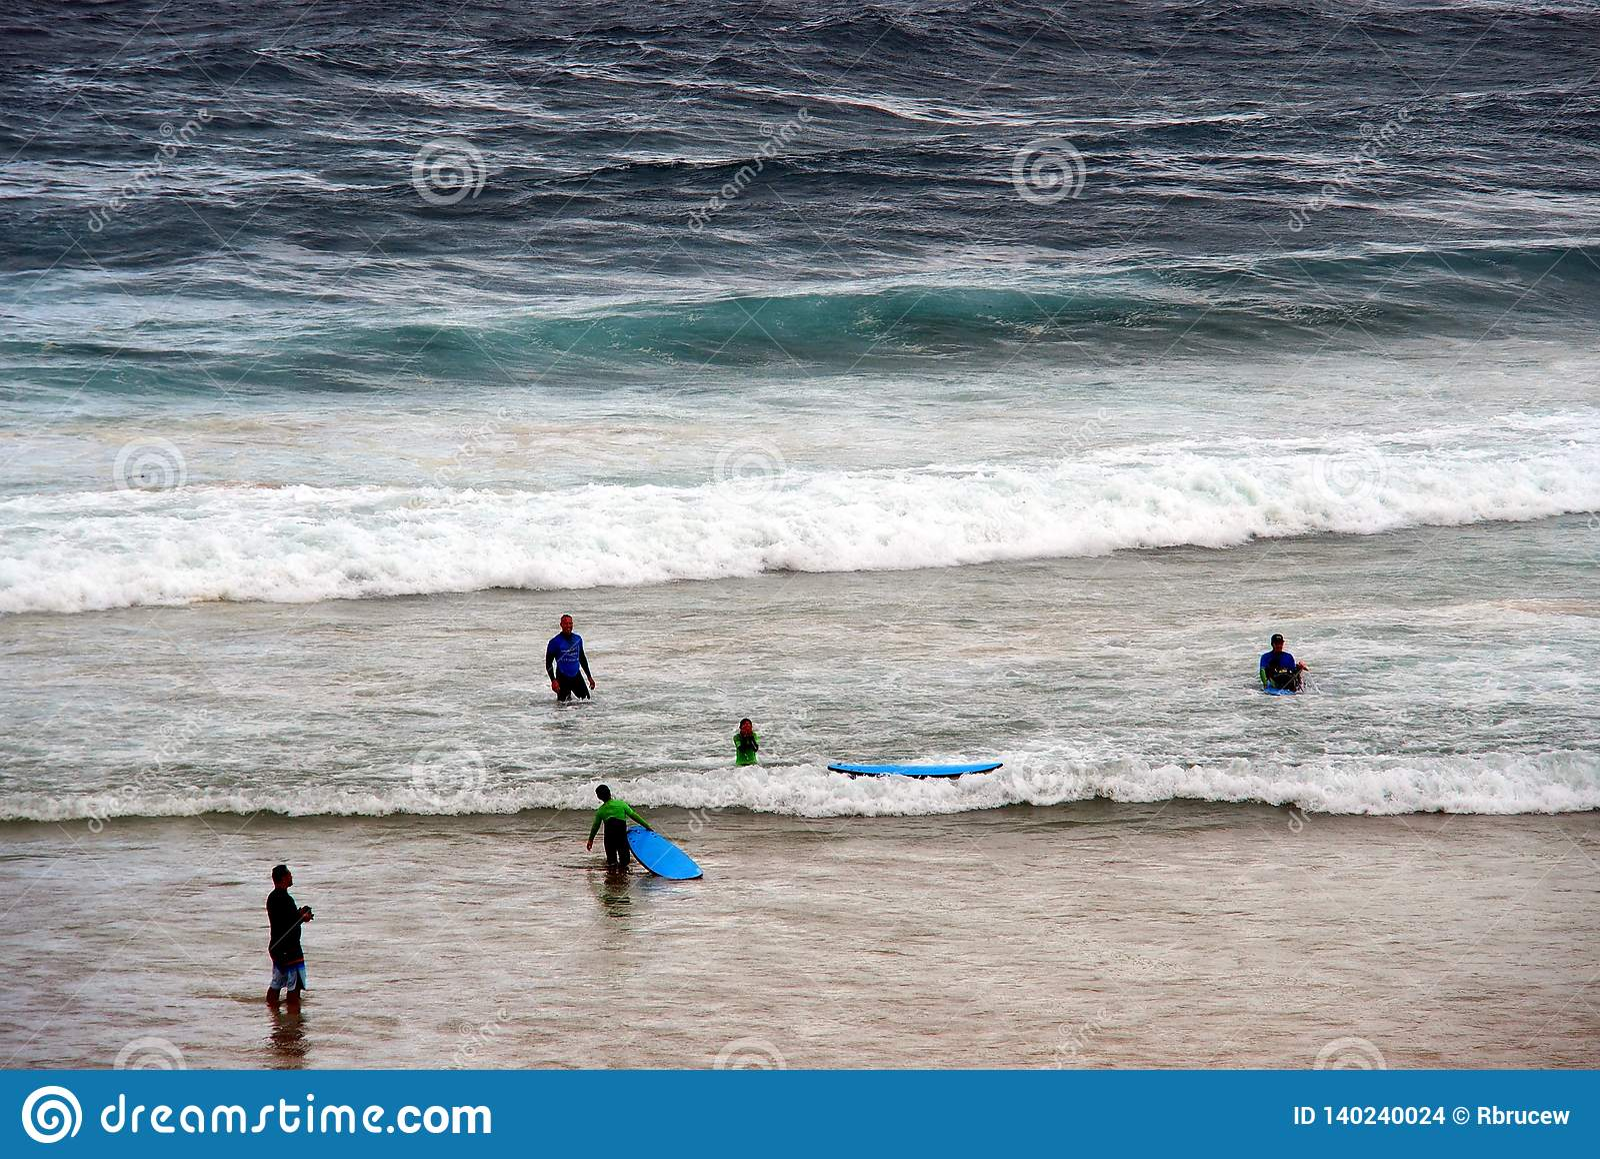 Swimmers In Rough Bondi Beach Surf, Sydney, Australia